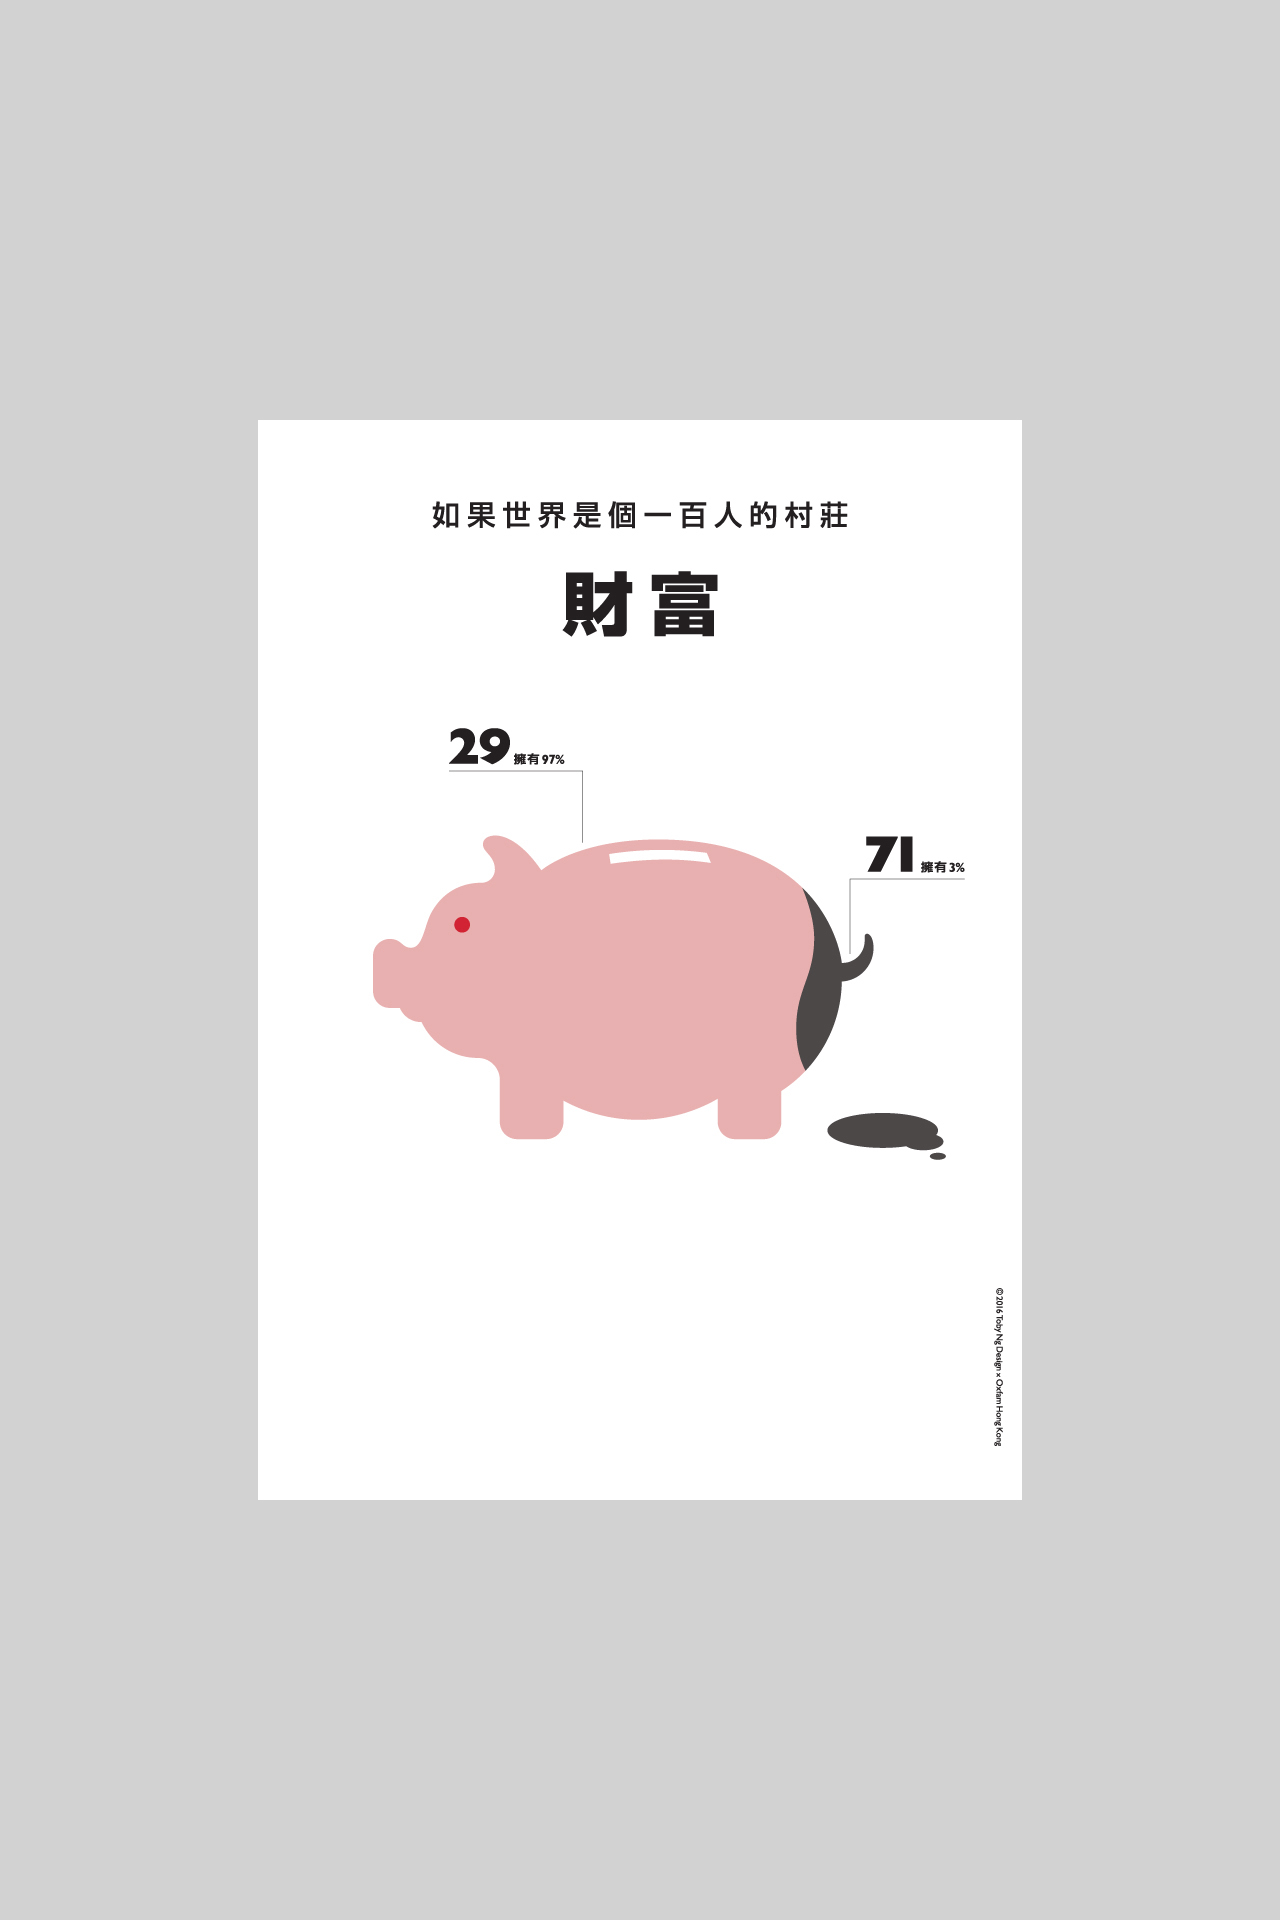 the-world-of-100-x-oxfam-hong-kong_03